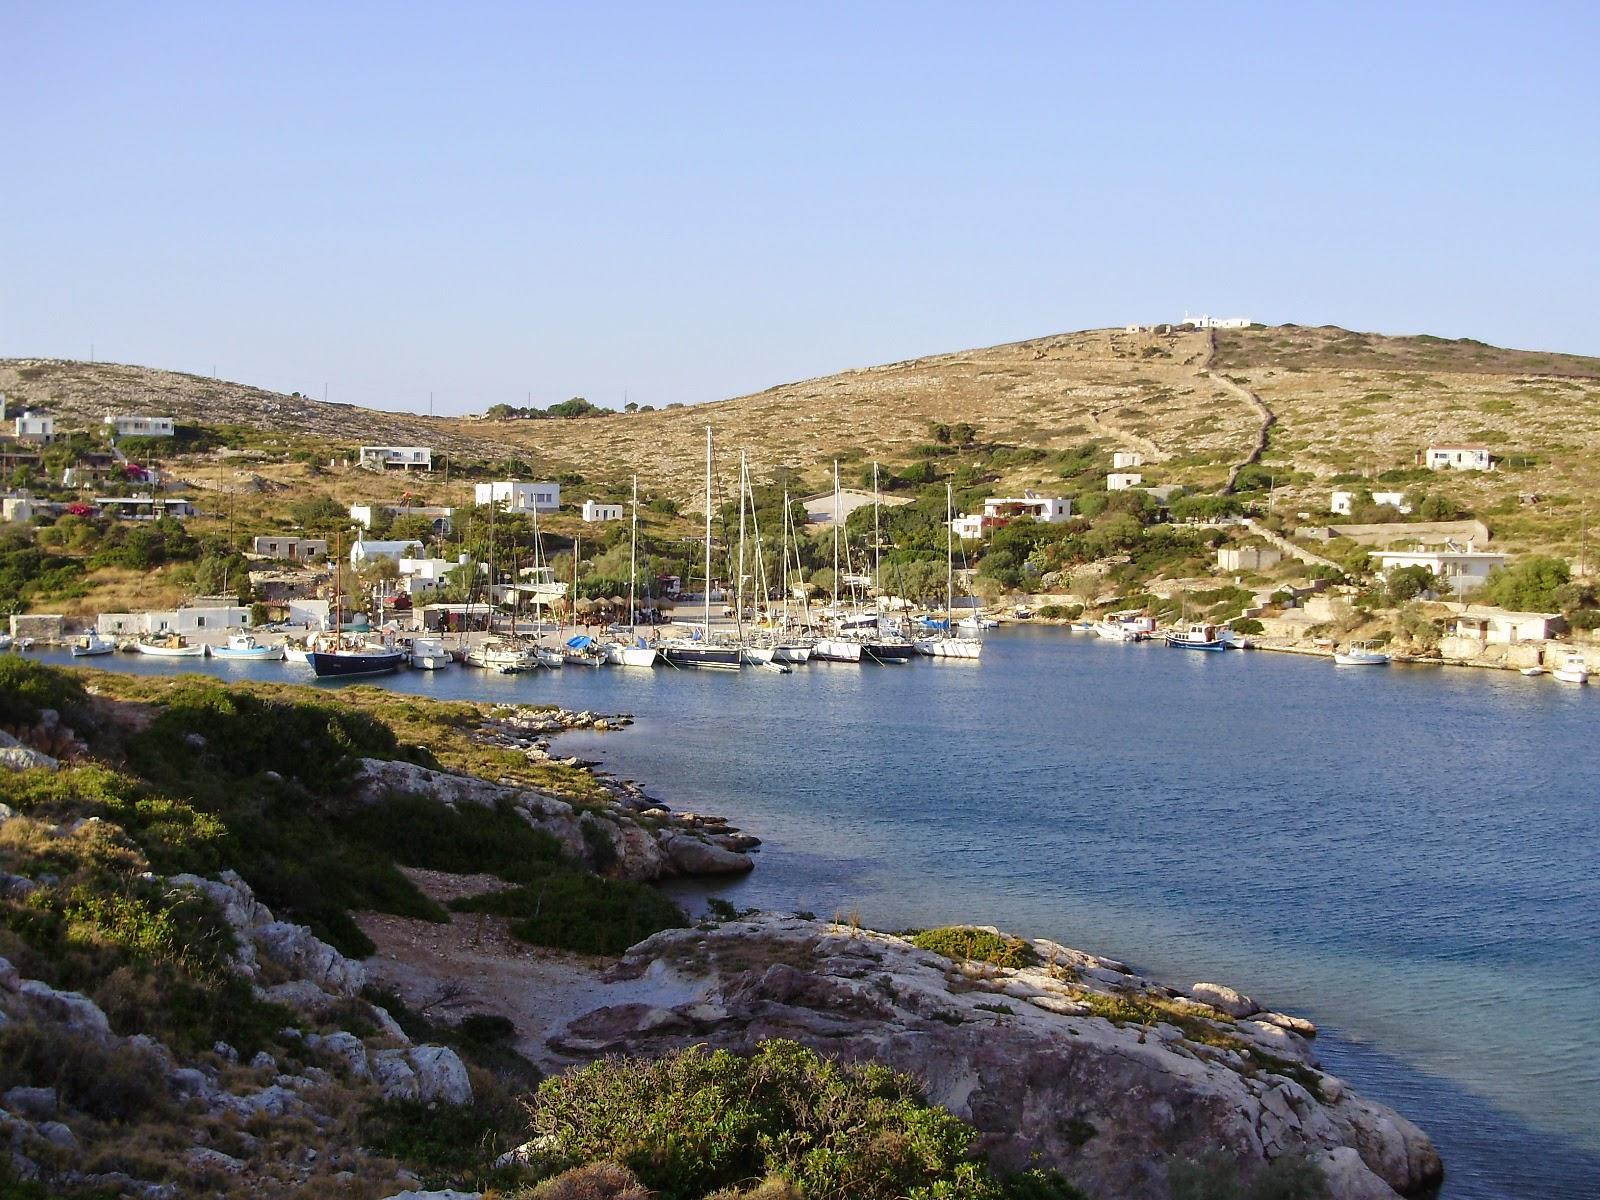 Arki, il porto